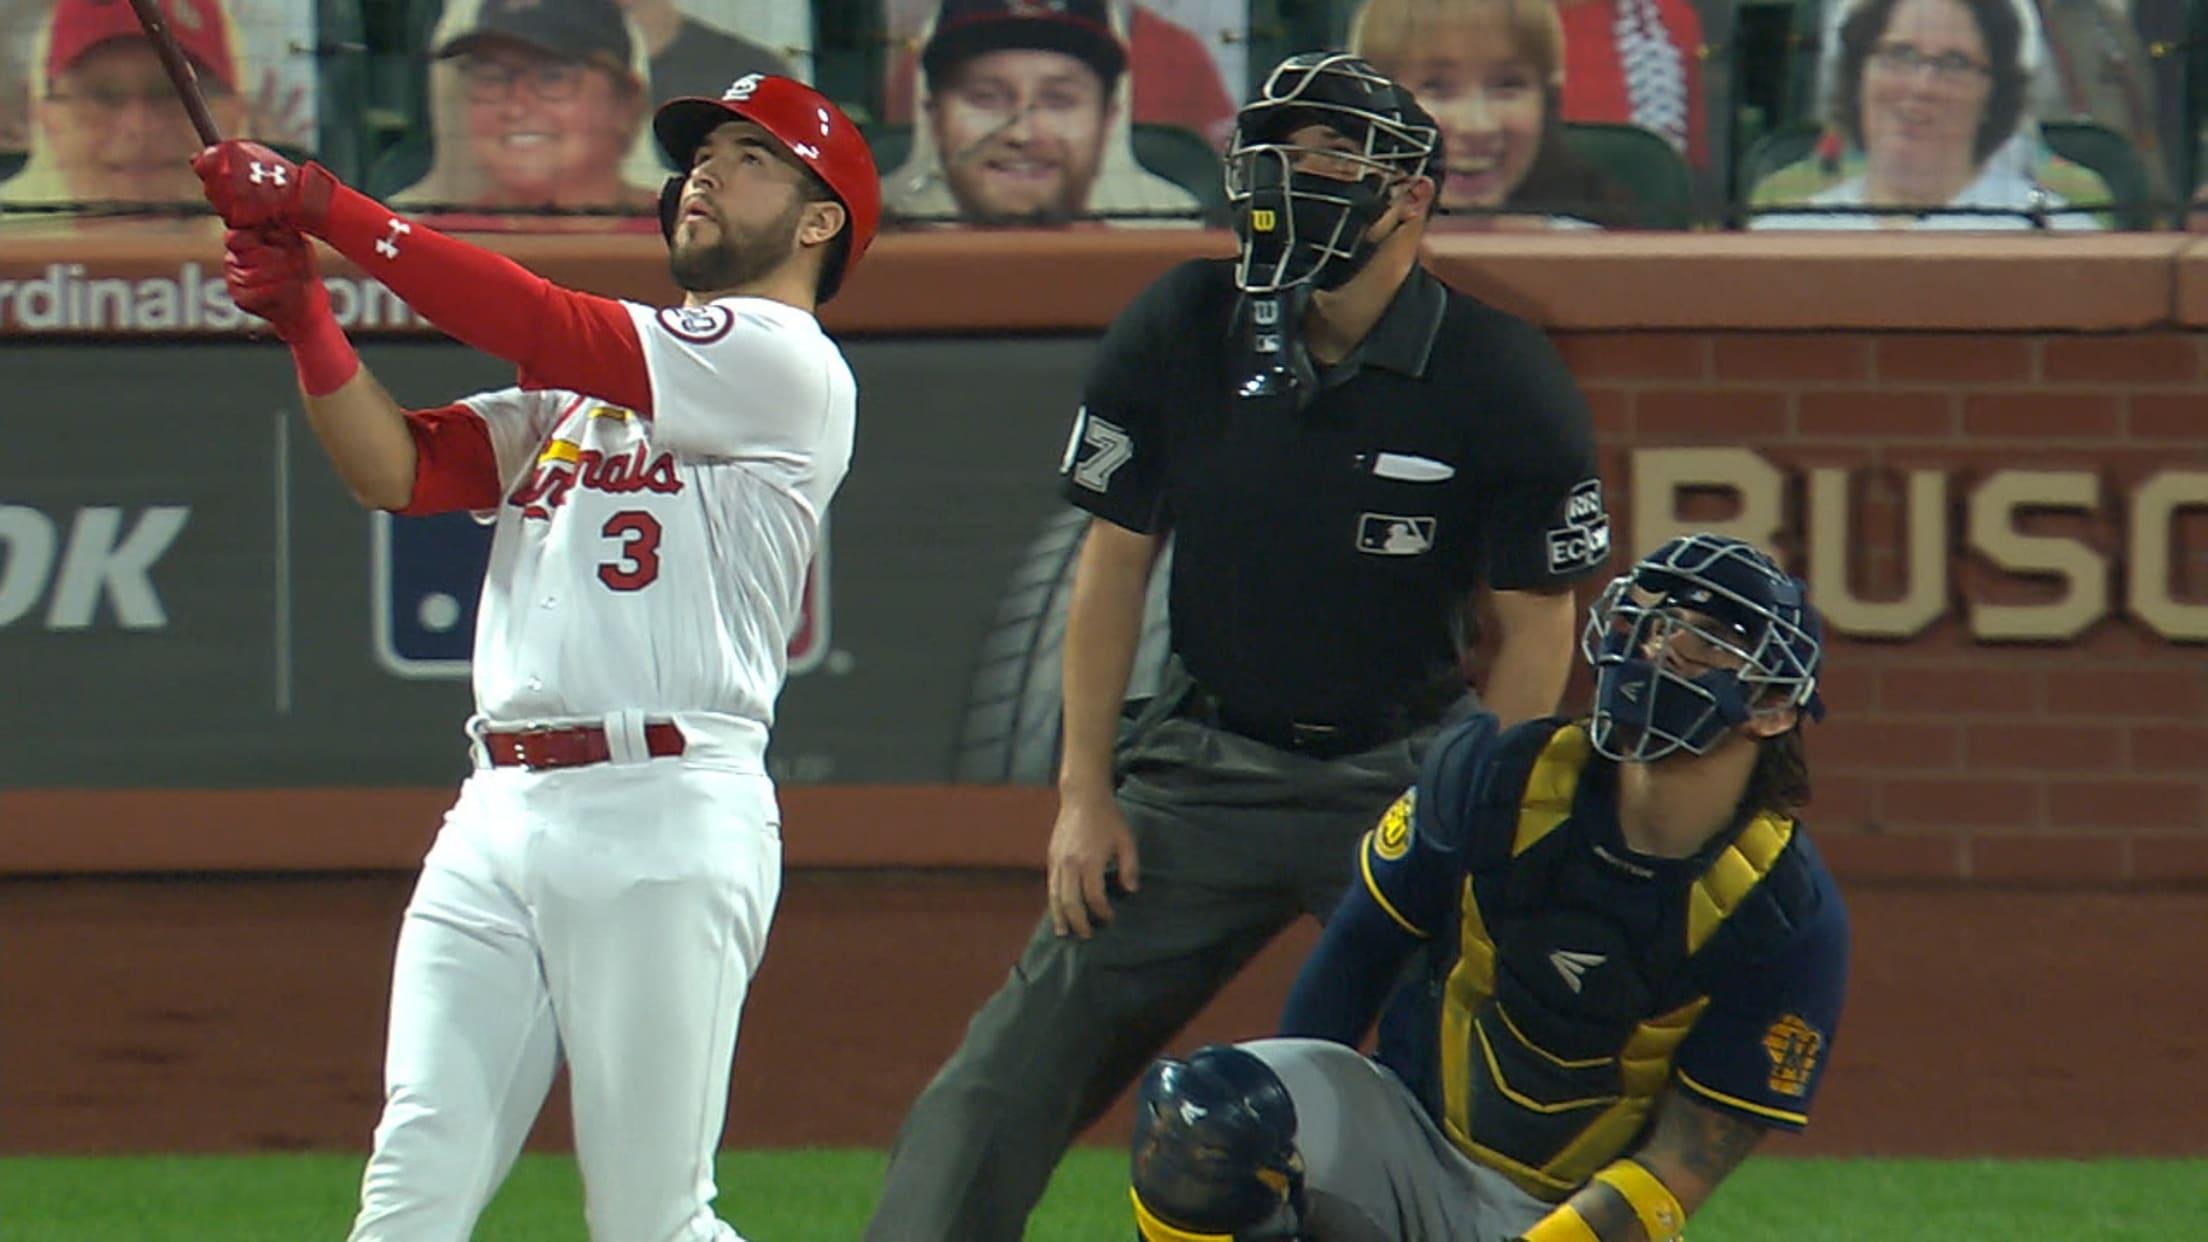 Dylan Carlson's two-run home run